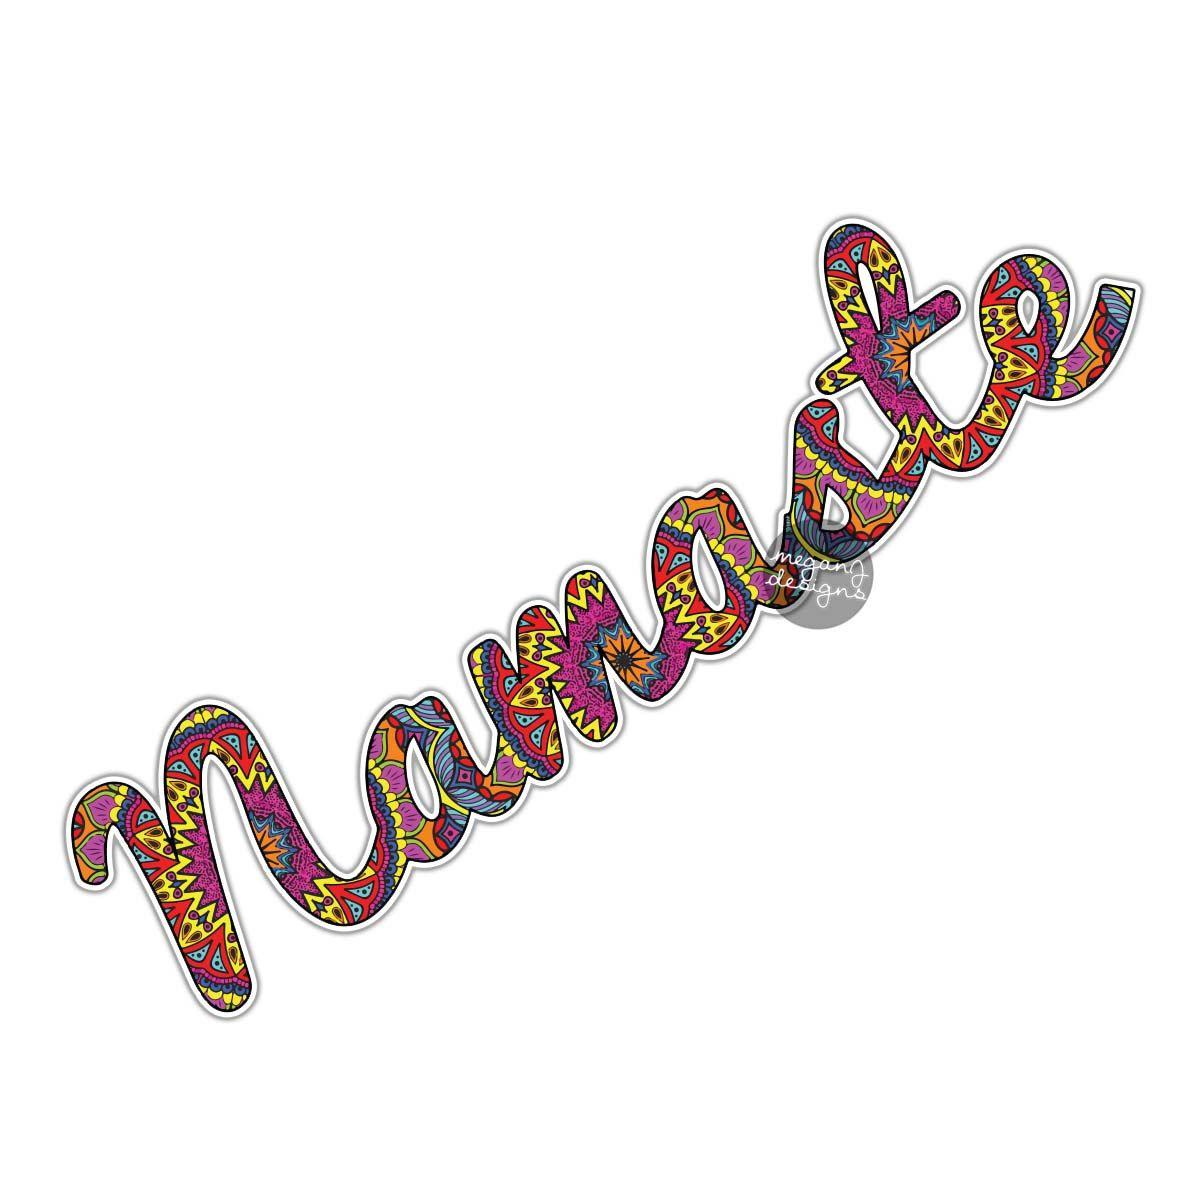 Namaste Yoga Sticker Colorful Car Decal Vinyl Bumper Sticker